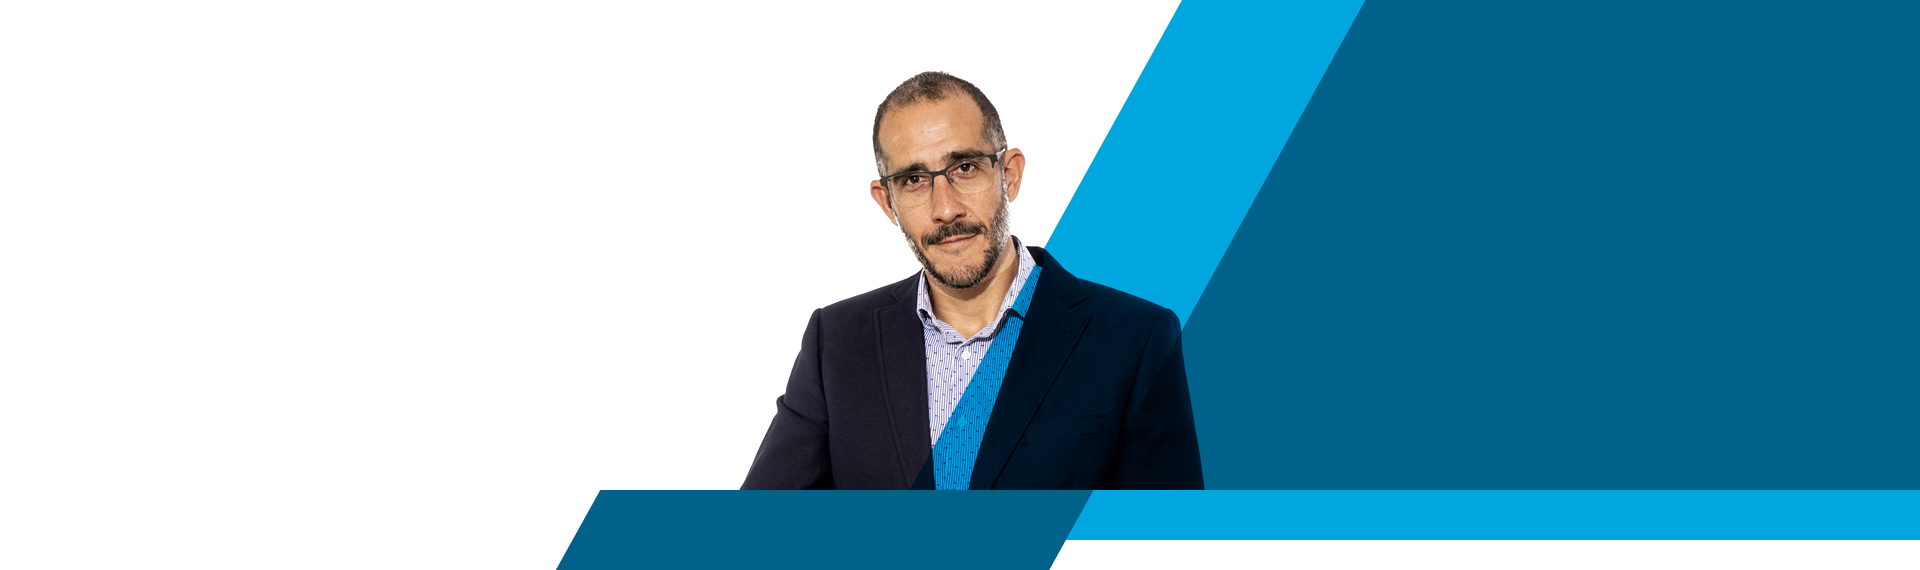 Ángel Quintana - Consultor de Marketing